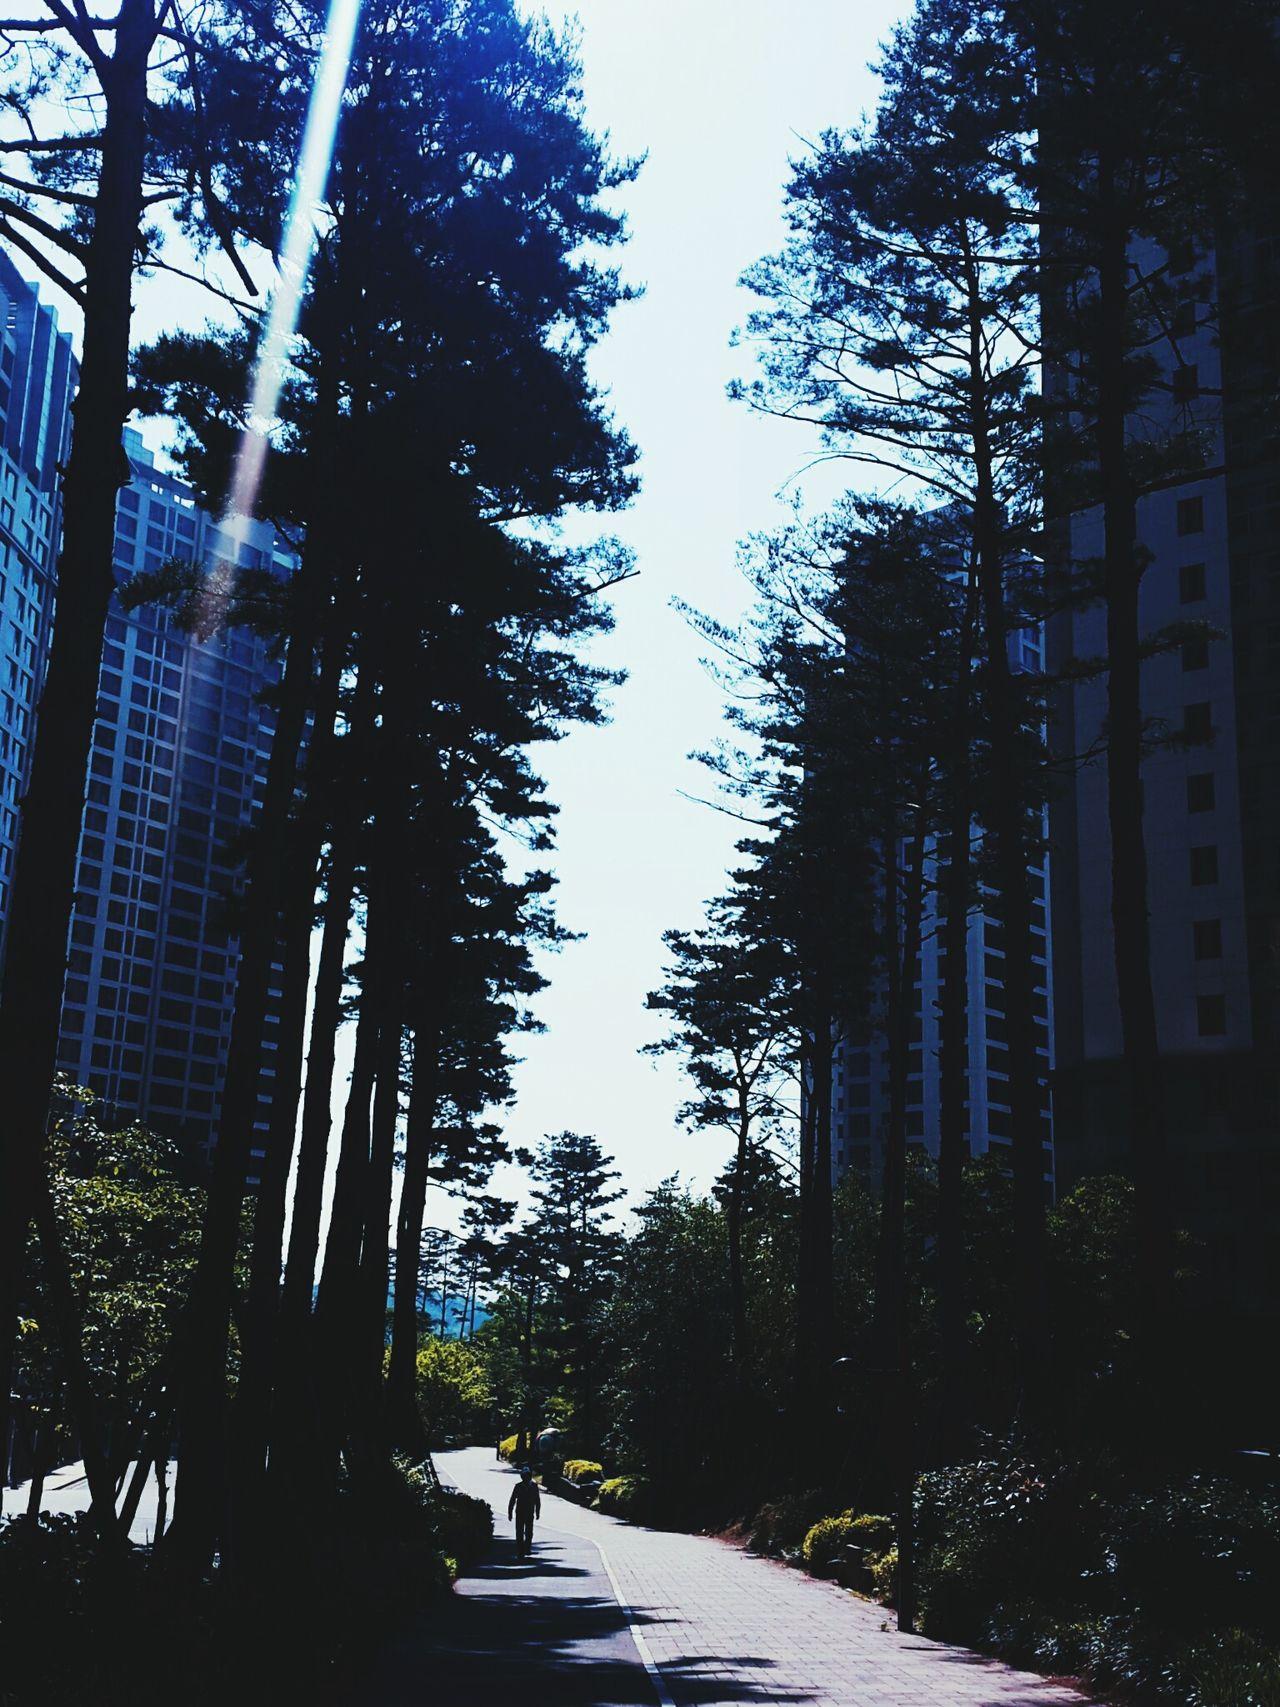 2016.5.20.0130Zulu Free Friday Morning Korea Wicity Sunshine 울창 first eyeem photo